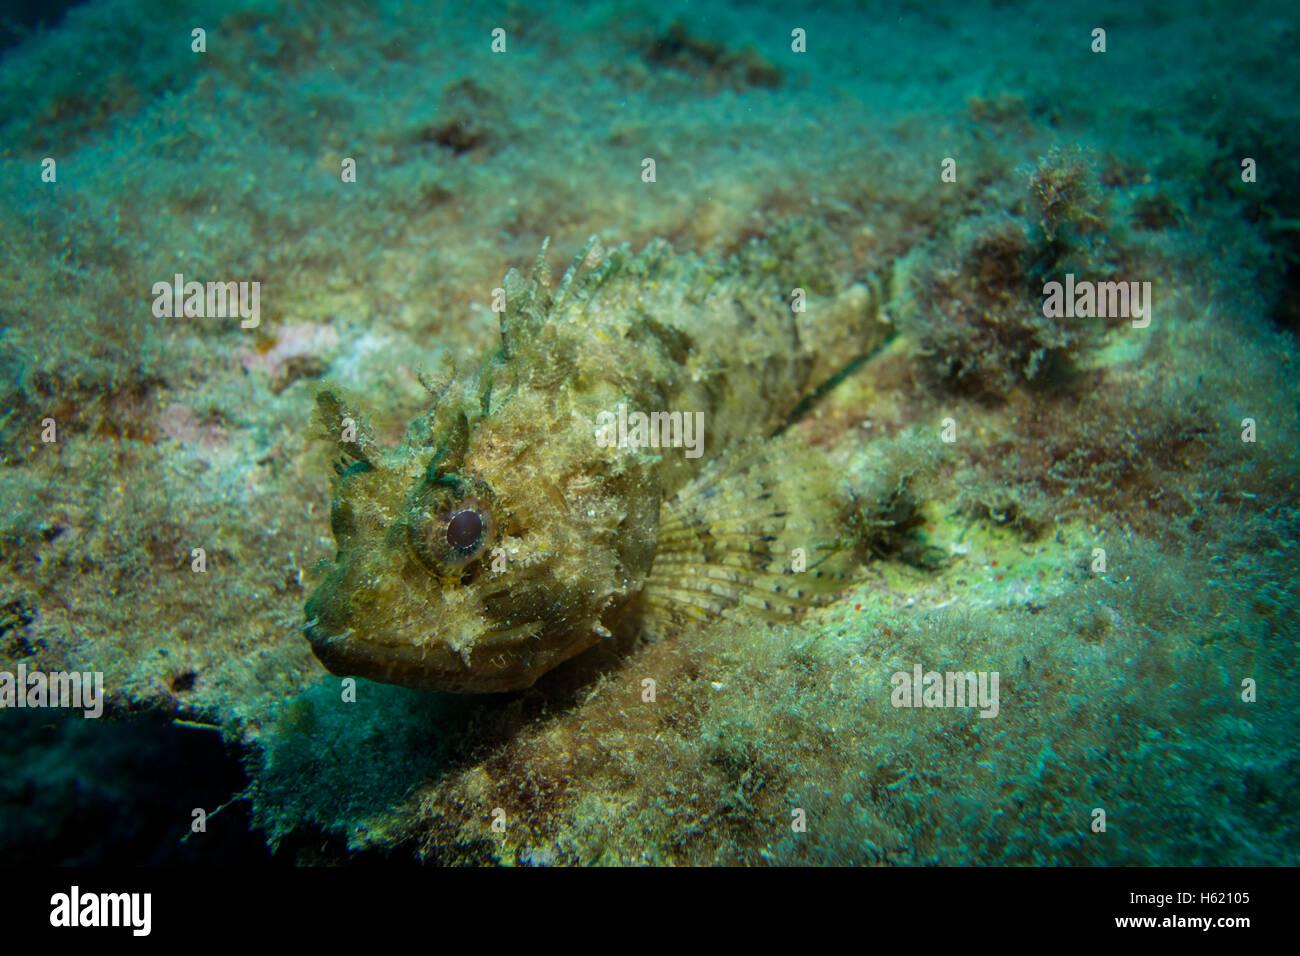 Full size Small Rockfish, Scorpaena notate, on algae covered rock. - Stock Image